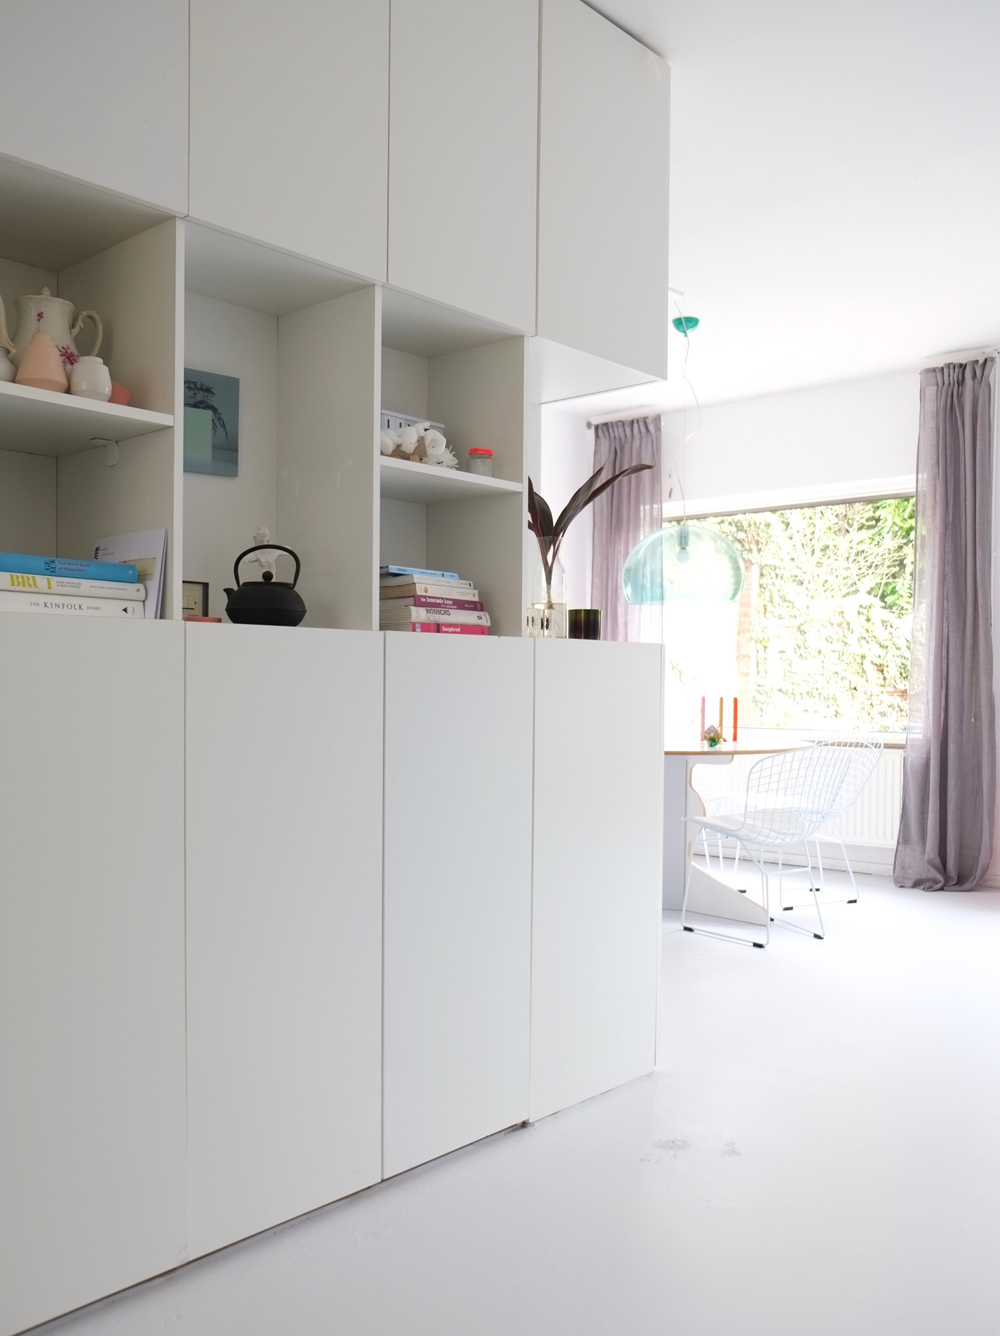 interieurstylingcursus-interieuradvies- woonkamerstylingideeen